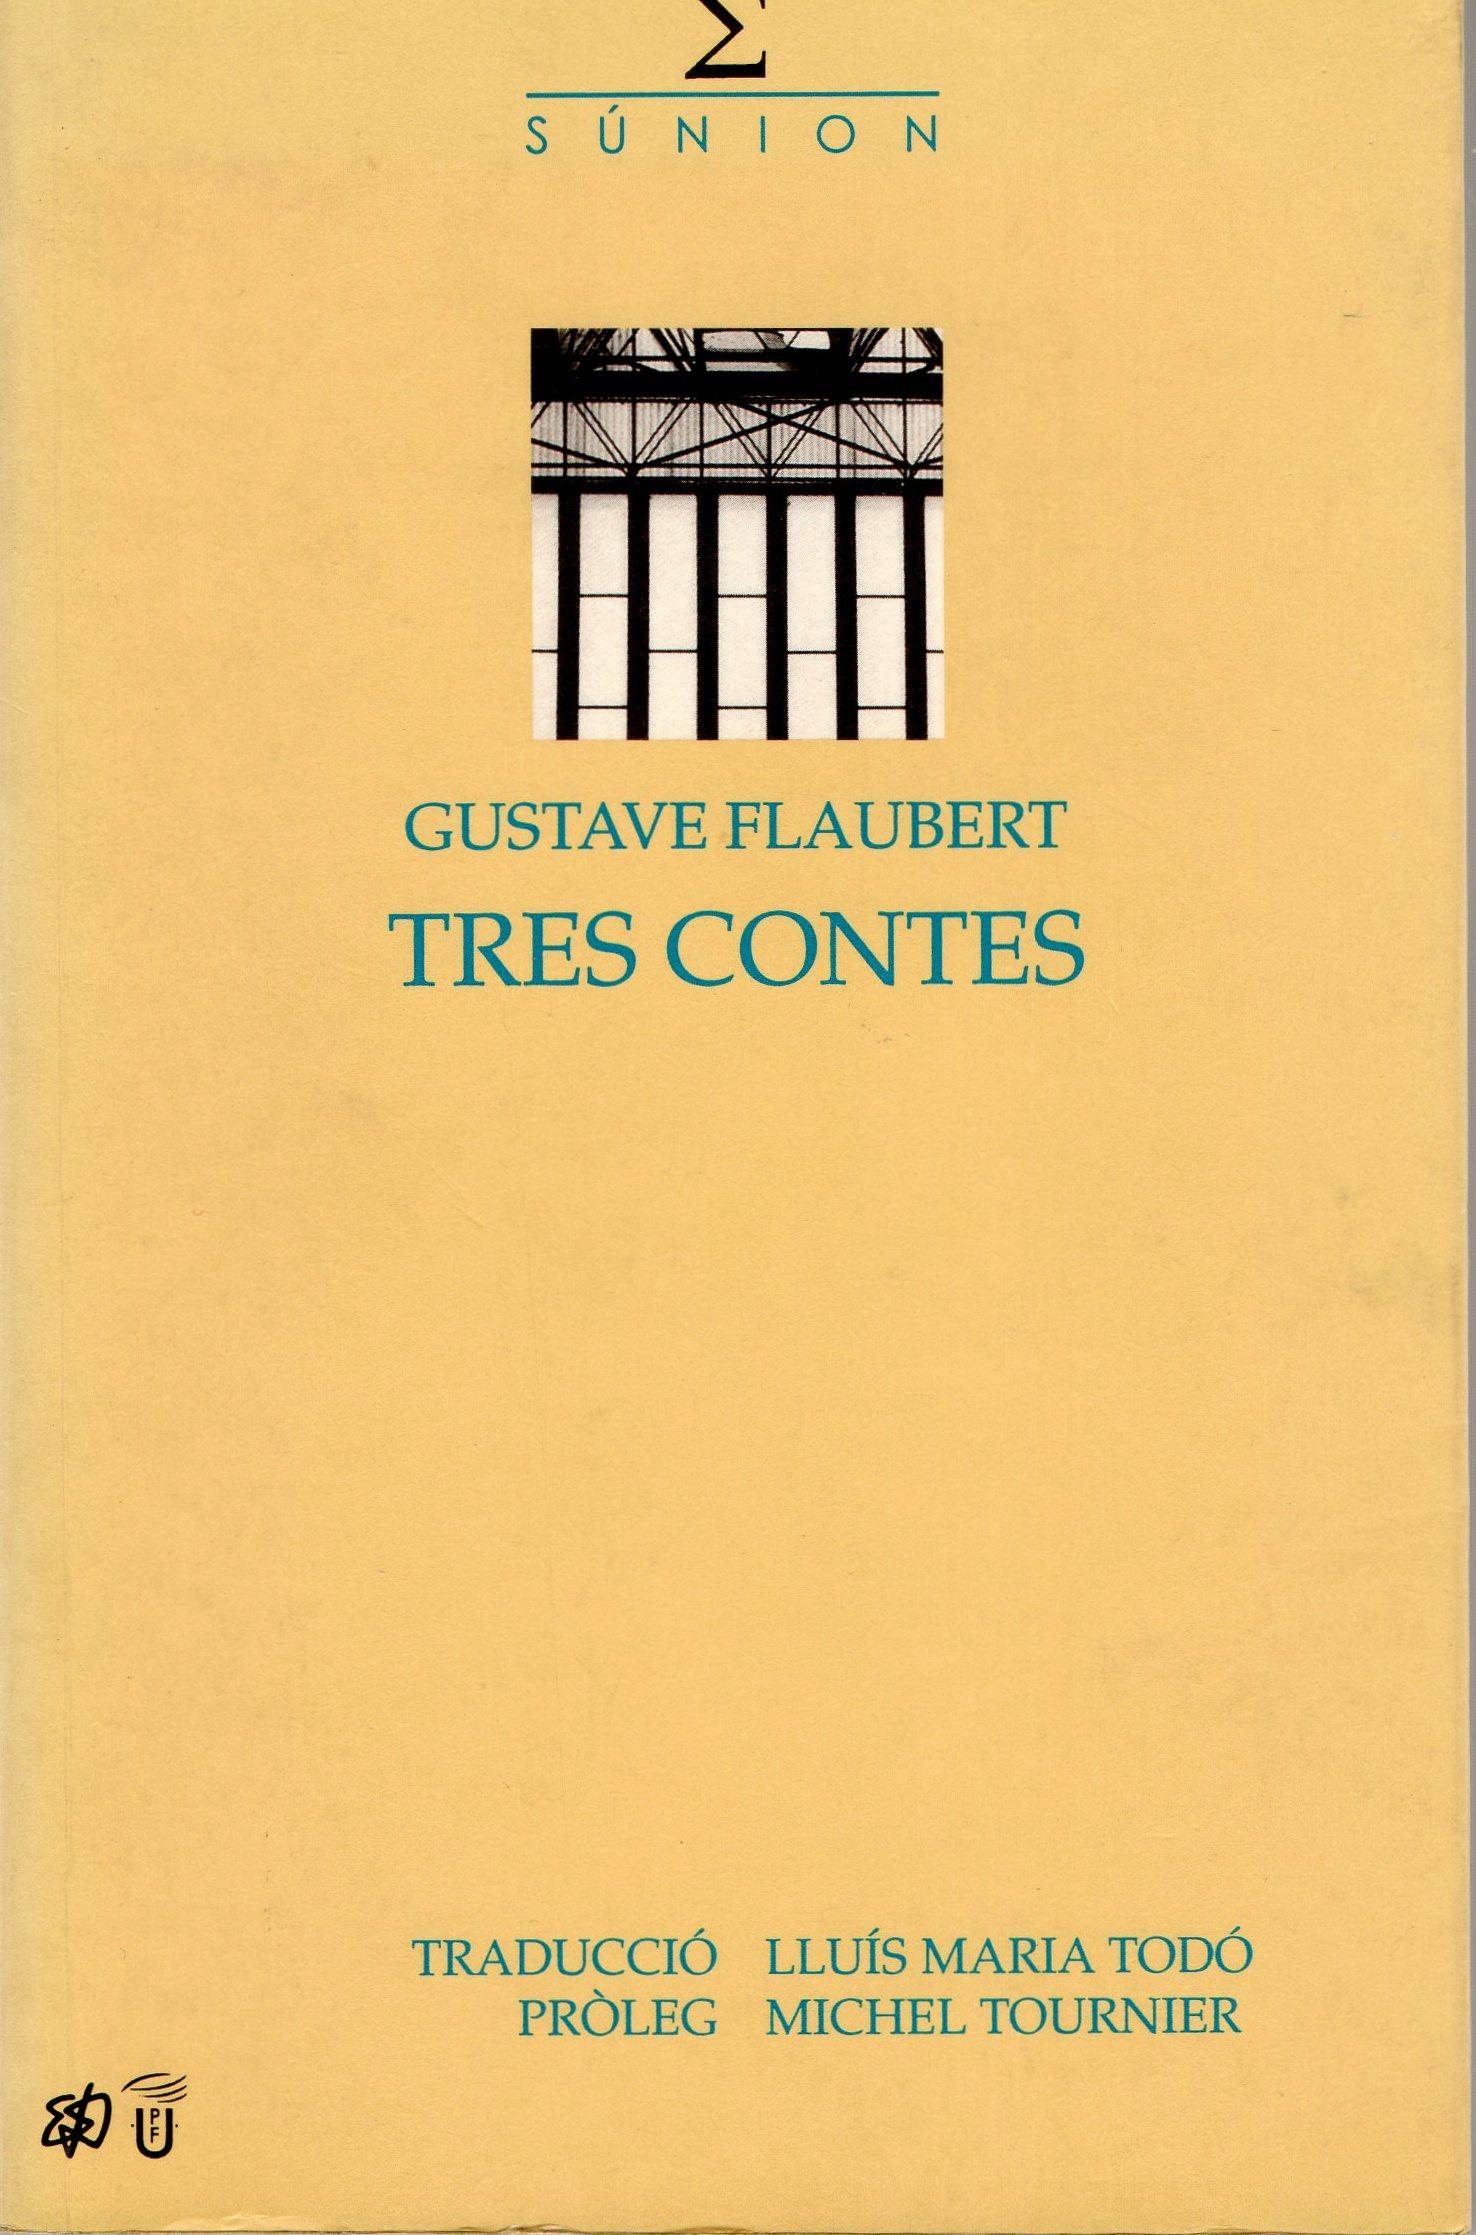 Tres contes